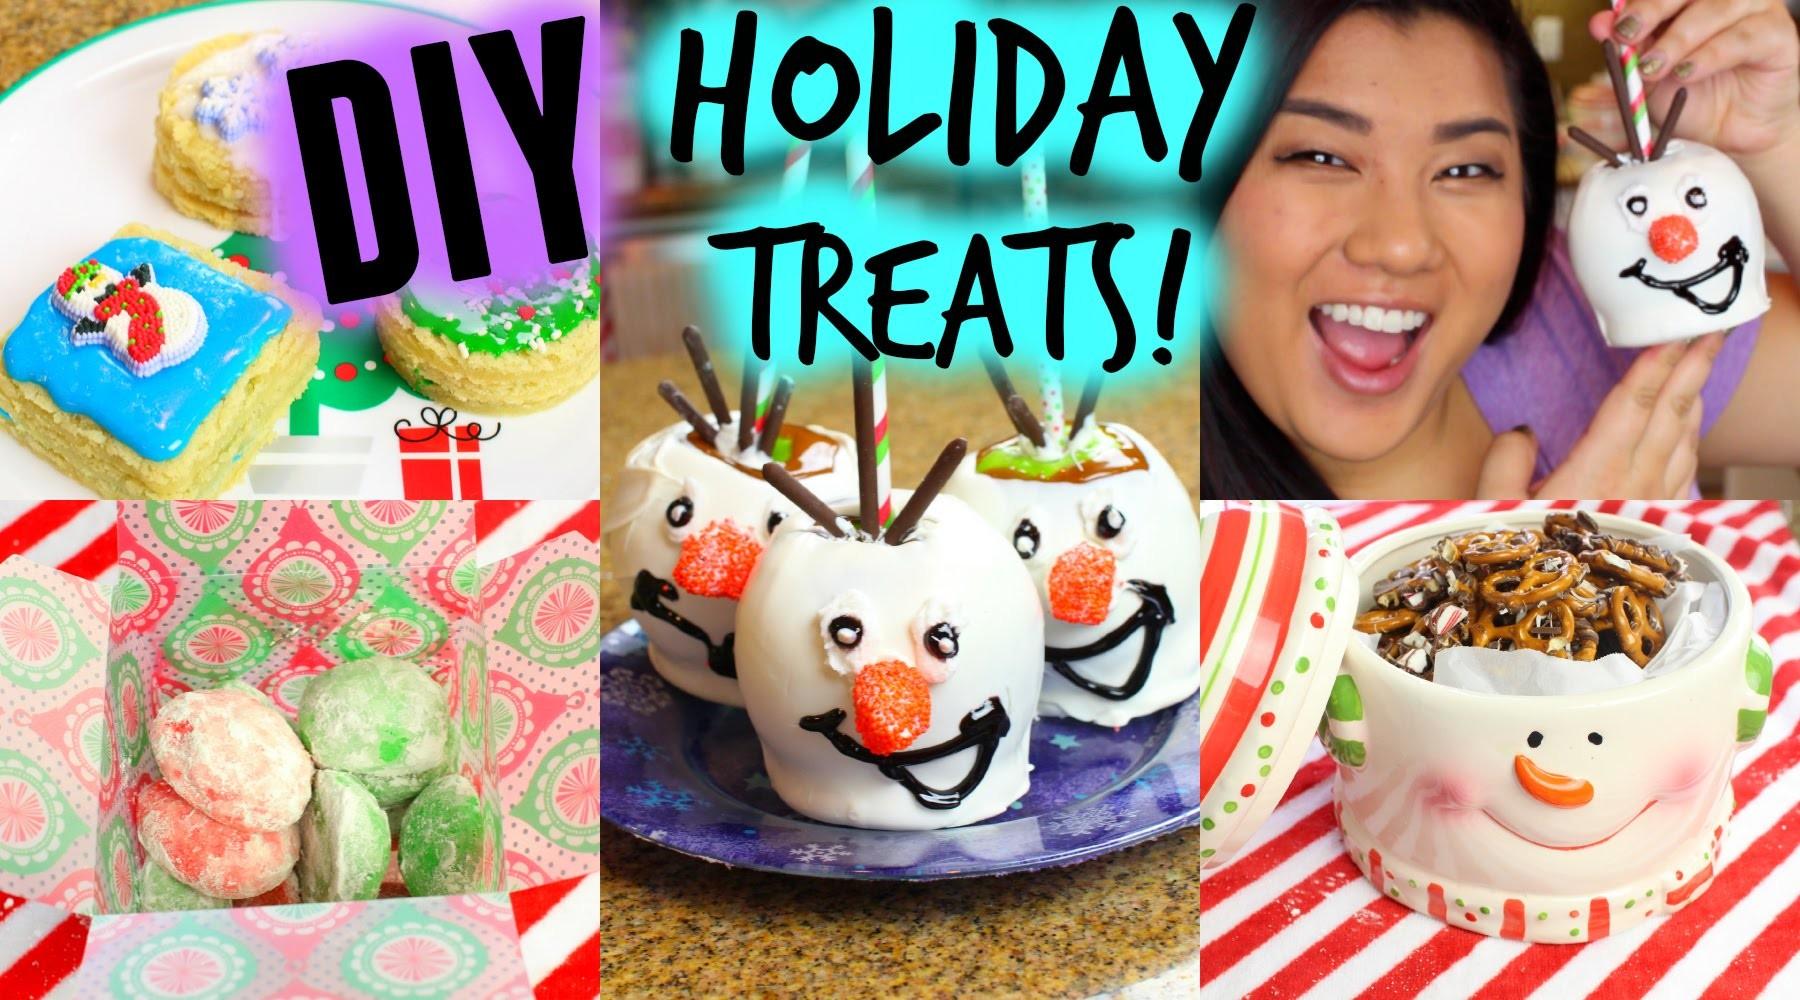 DIY HOLIDAY TREATS!! Olaf Caramel Apples, Cookies, & More!